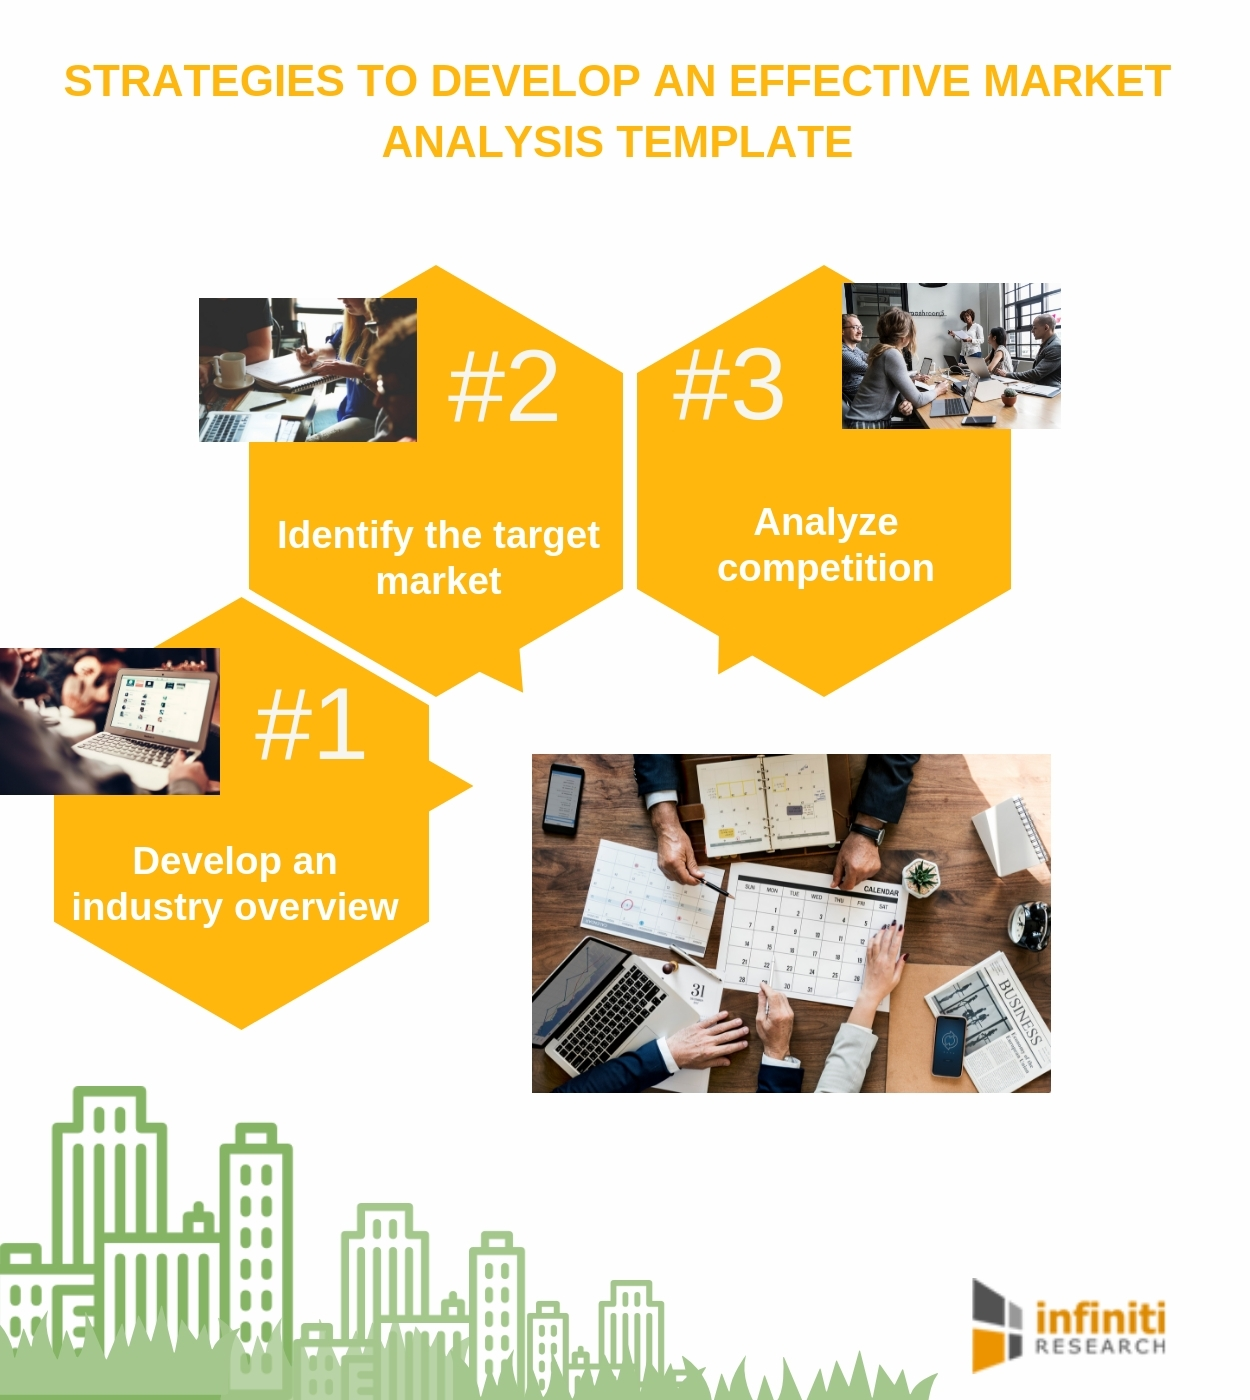 infiniti research s market analysis template identifying the target